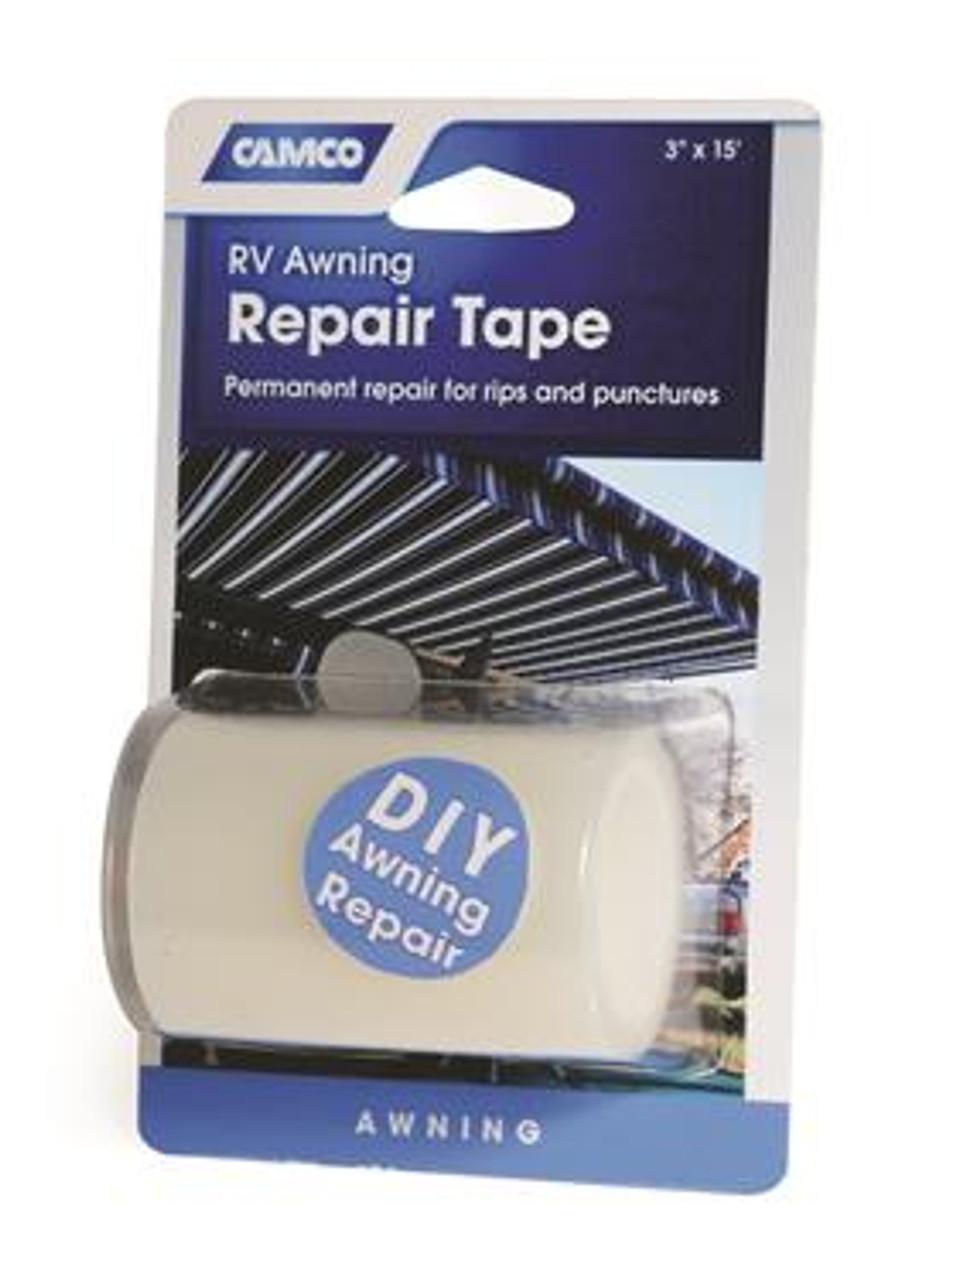 "Camco Awning Repair Tape, 3"" x 15'"